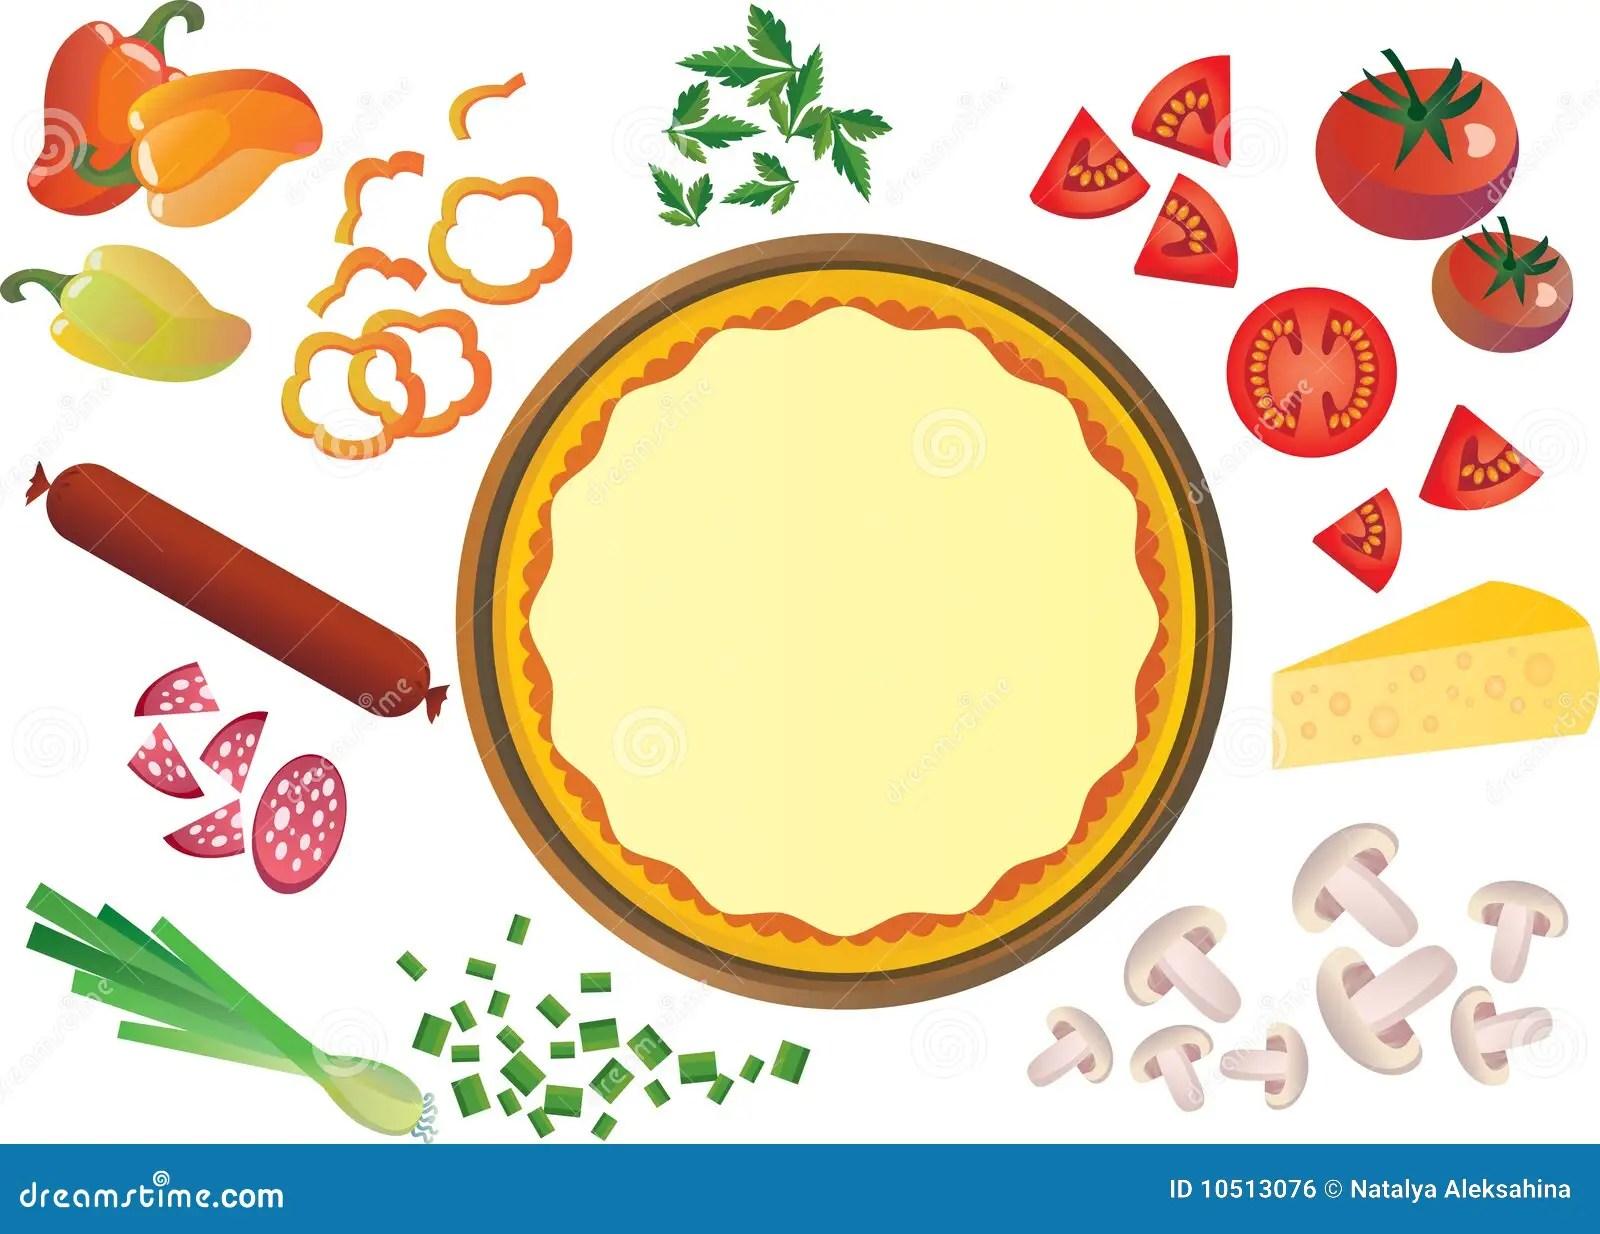 Pizza Ingre Nts Stock Vector Illustration Of Crumbs